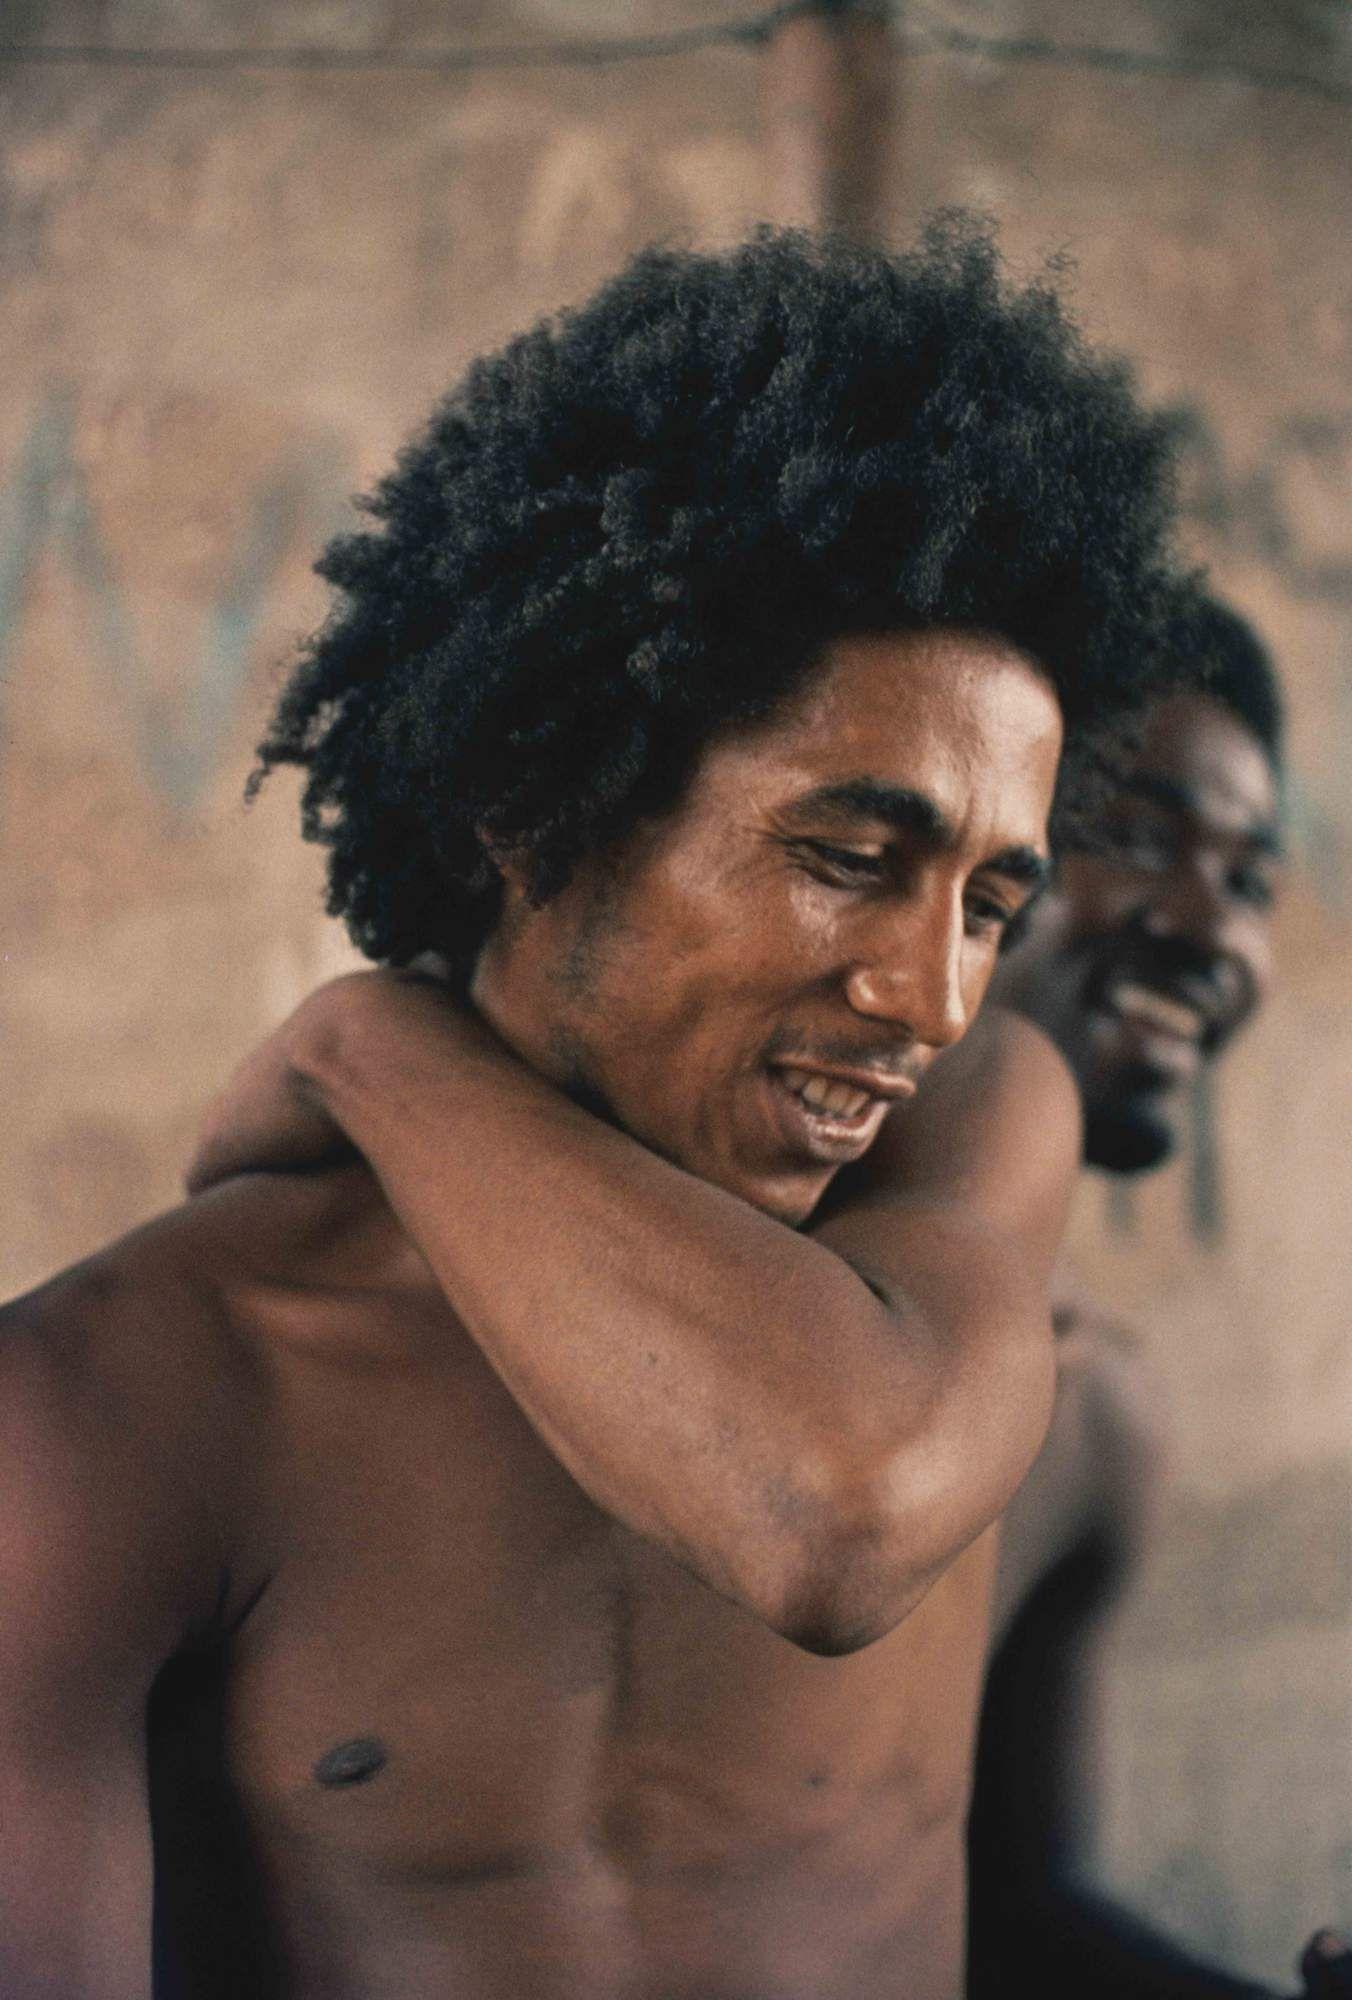 De Quoi Est Mort Bob Marley : marley, Résultat, Recherche, D'images, Marley, Quoi